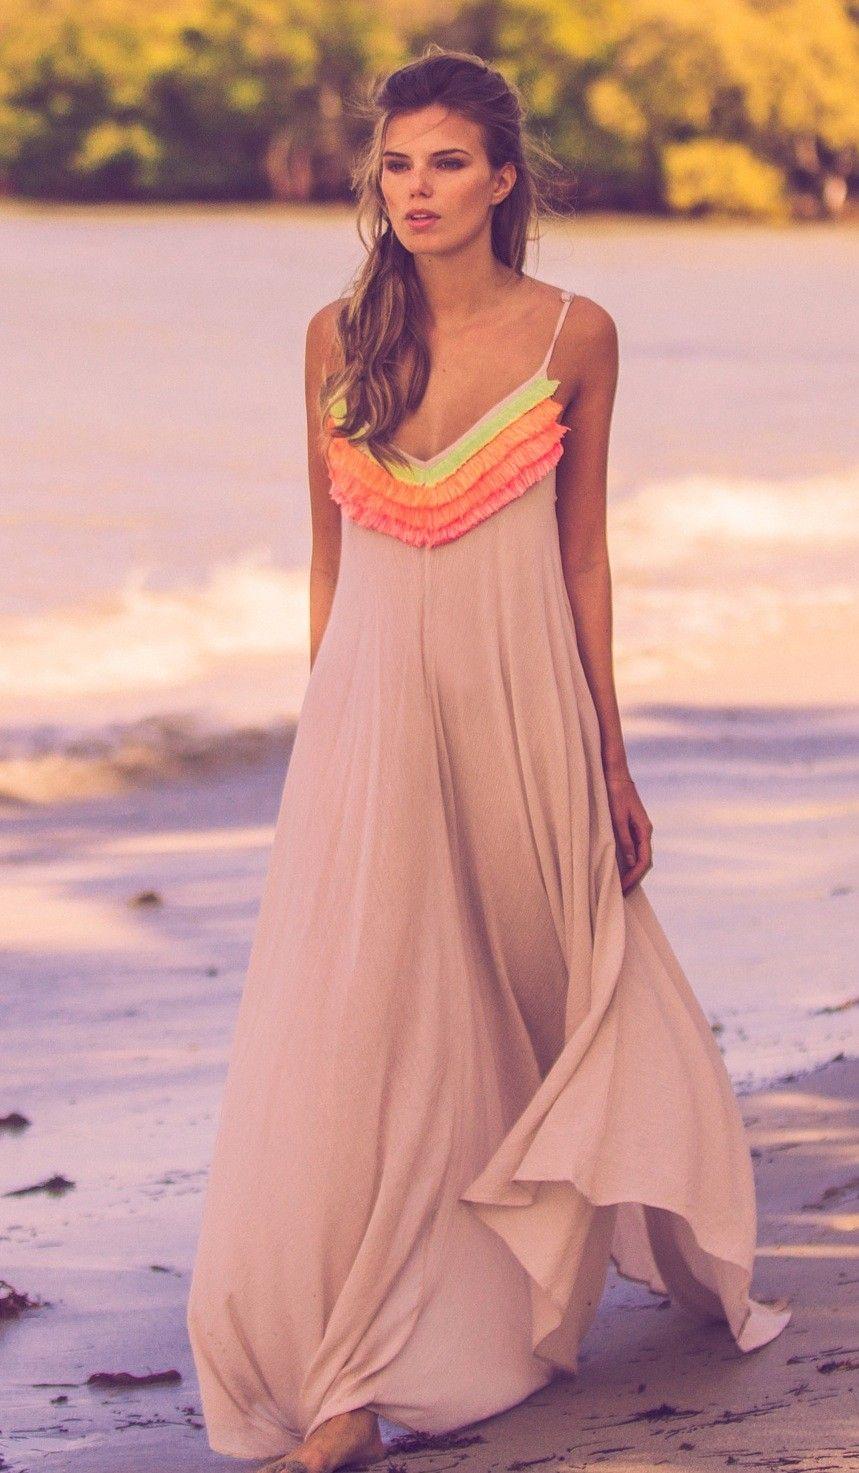 Mara Hoffman Fringe Handkerchief Dress   Nic del Mar   Stitch Fix ...